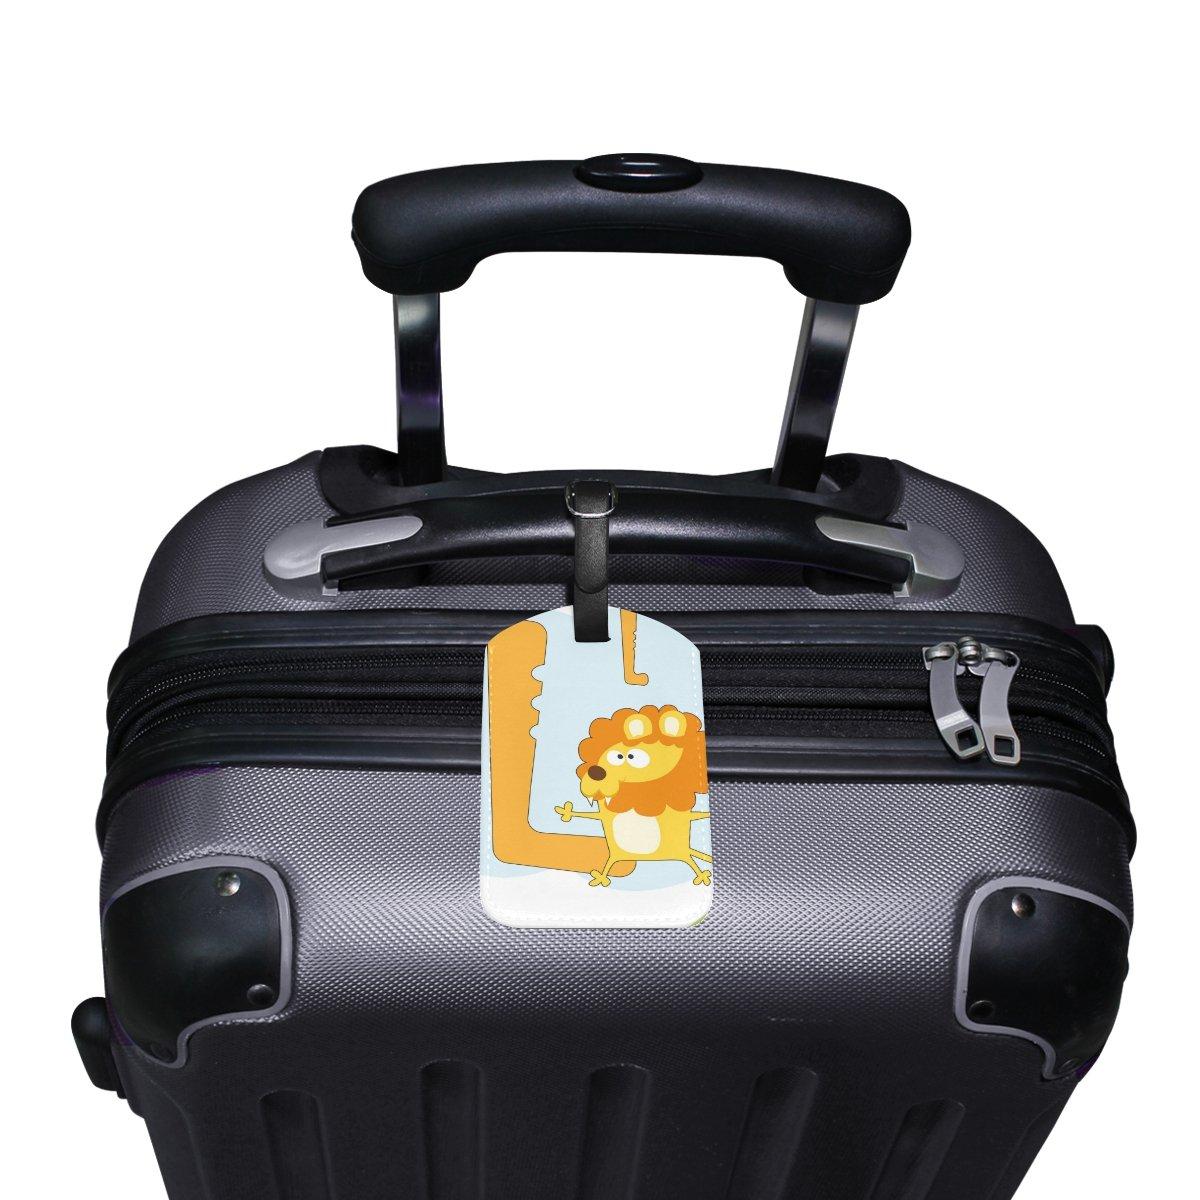 Saobao Travel Luggage Tag Funny Cute Lion PU Leather Baggage Travel ID